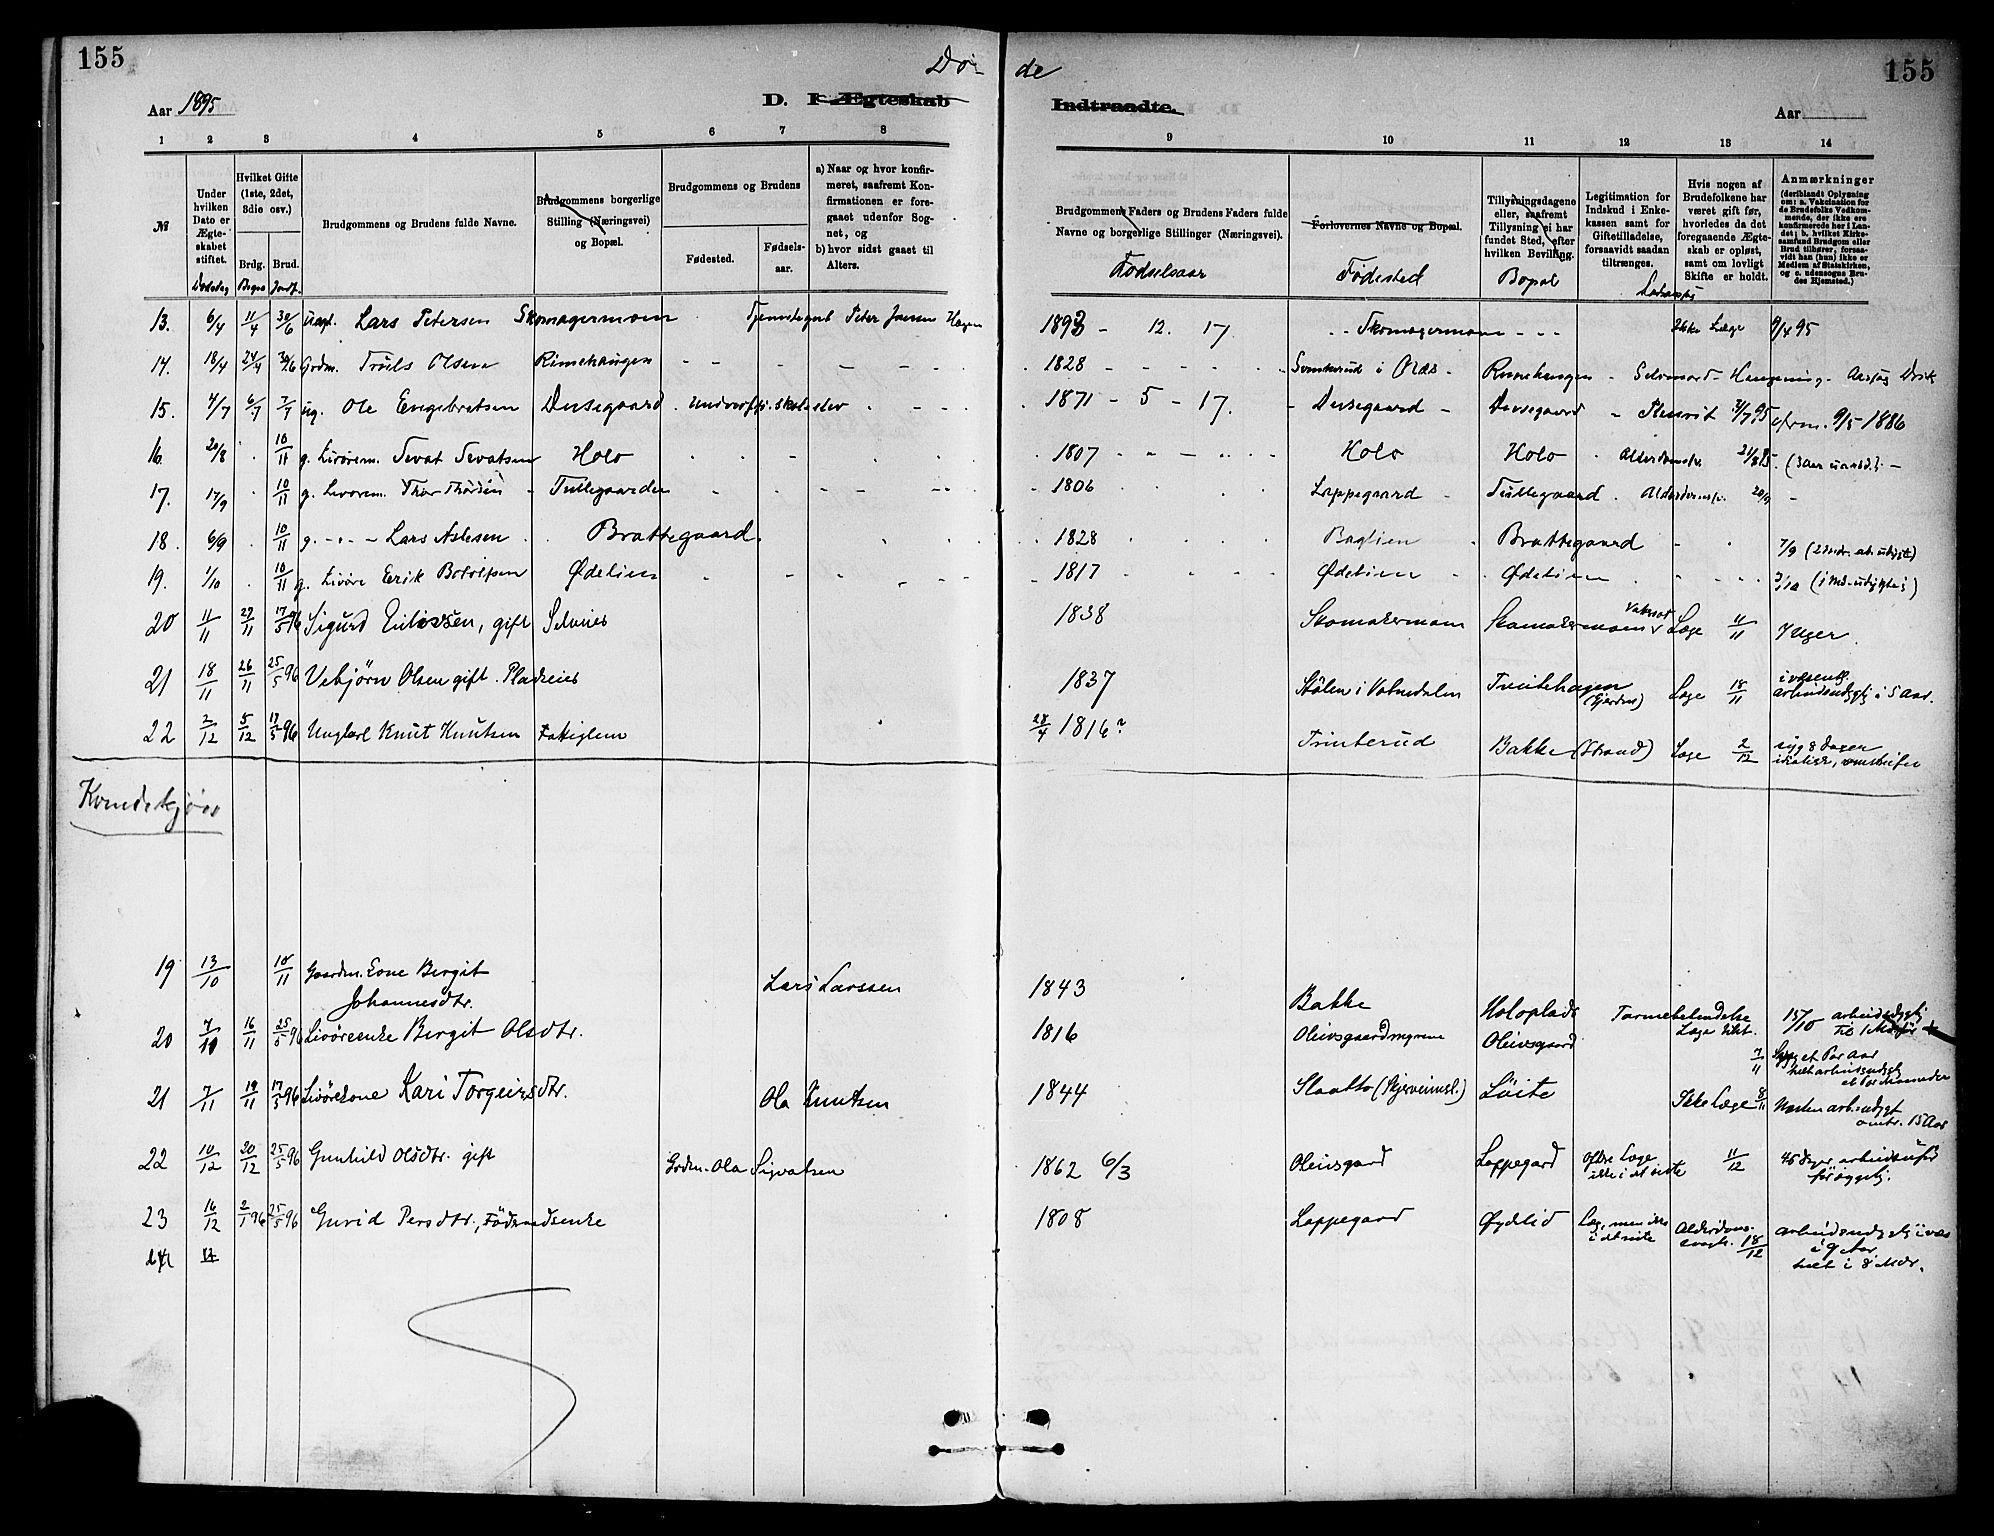 SAKO, Ål kirkebøker, F/Fa/L0008: Ministerialbok nr. I 8, 1882-1896, s. 155